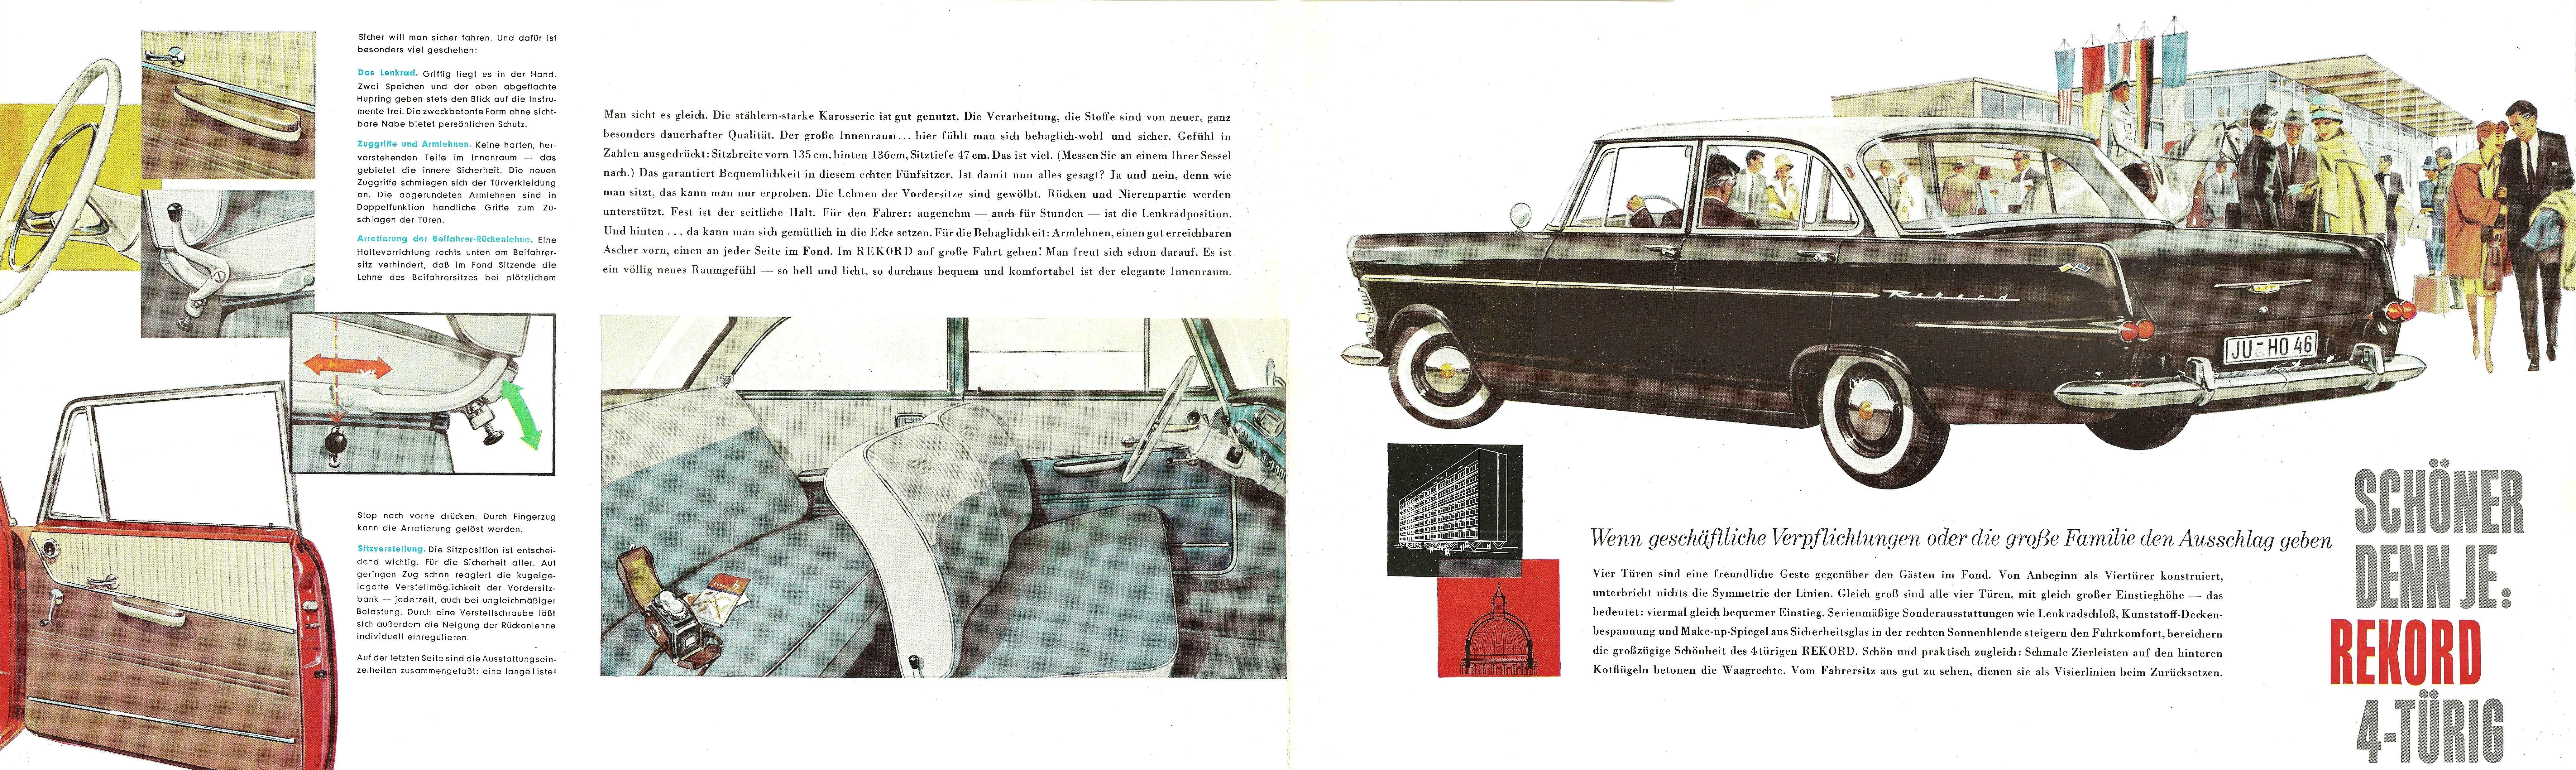 1961 Opel Rekord P2 Brochure